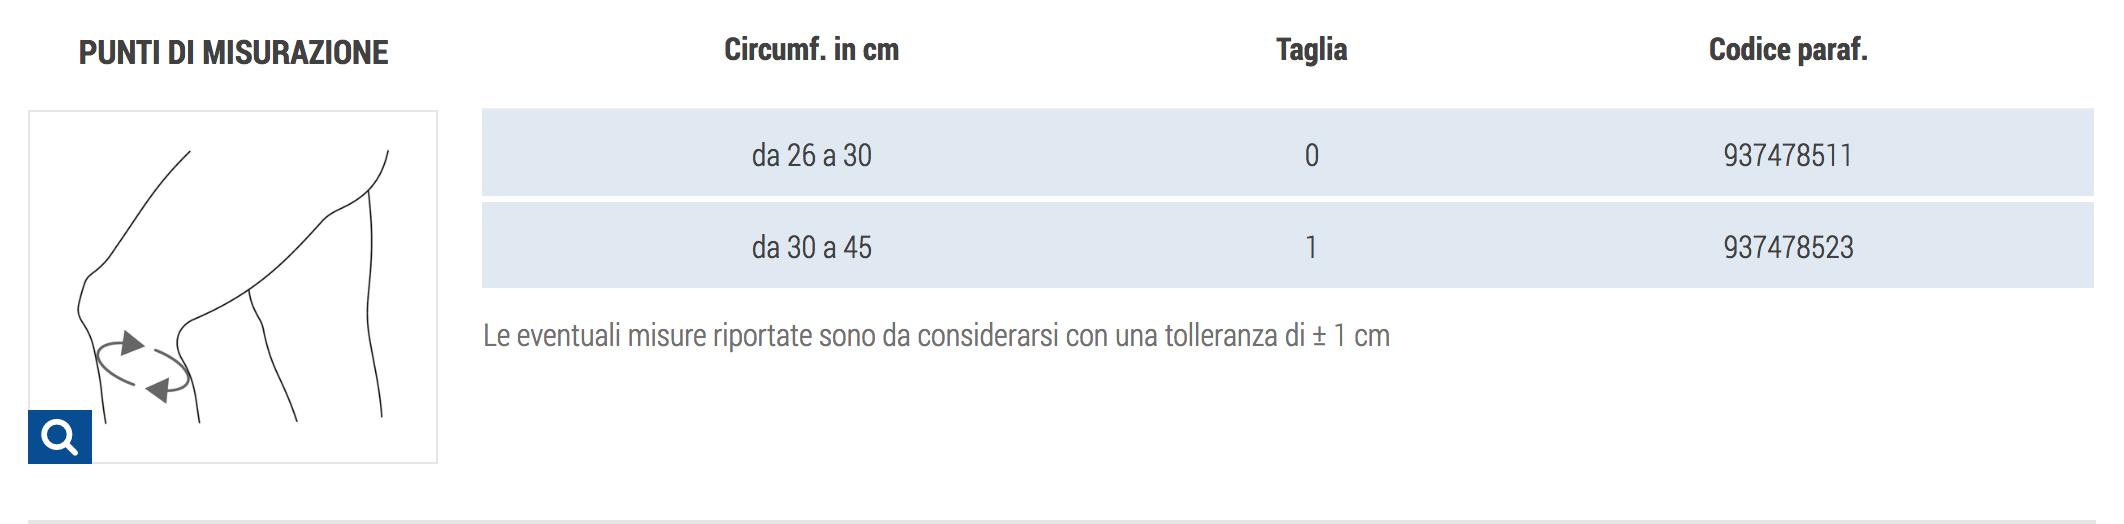 PRESSORE SOTTOROTULEO - Cinturino sottorotuleo